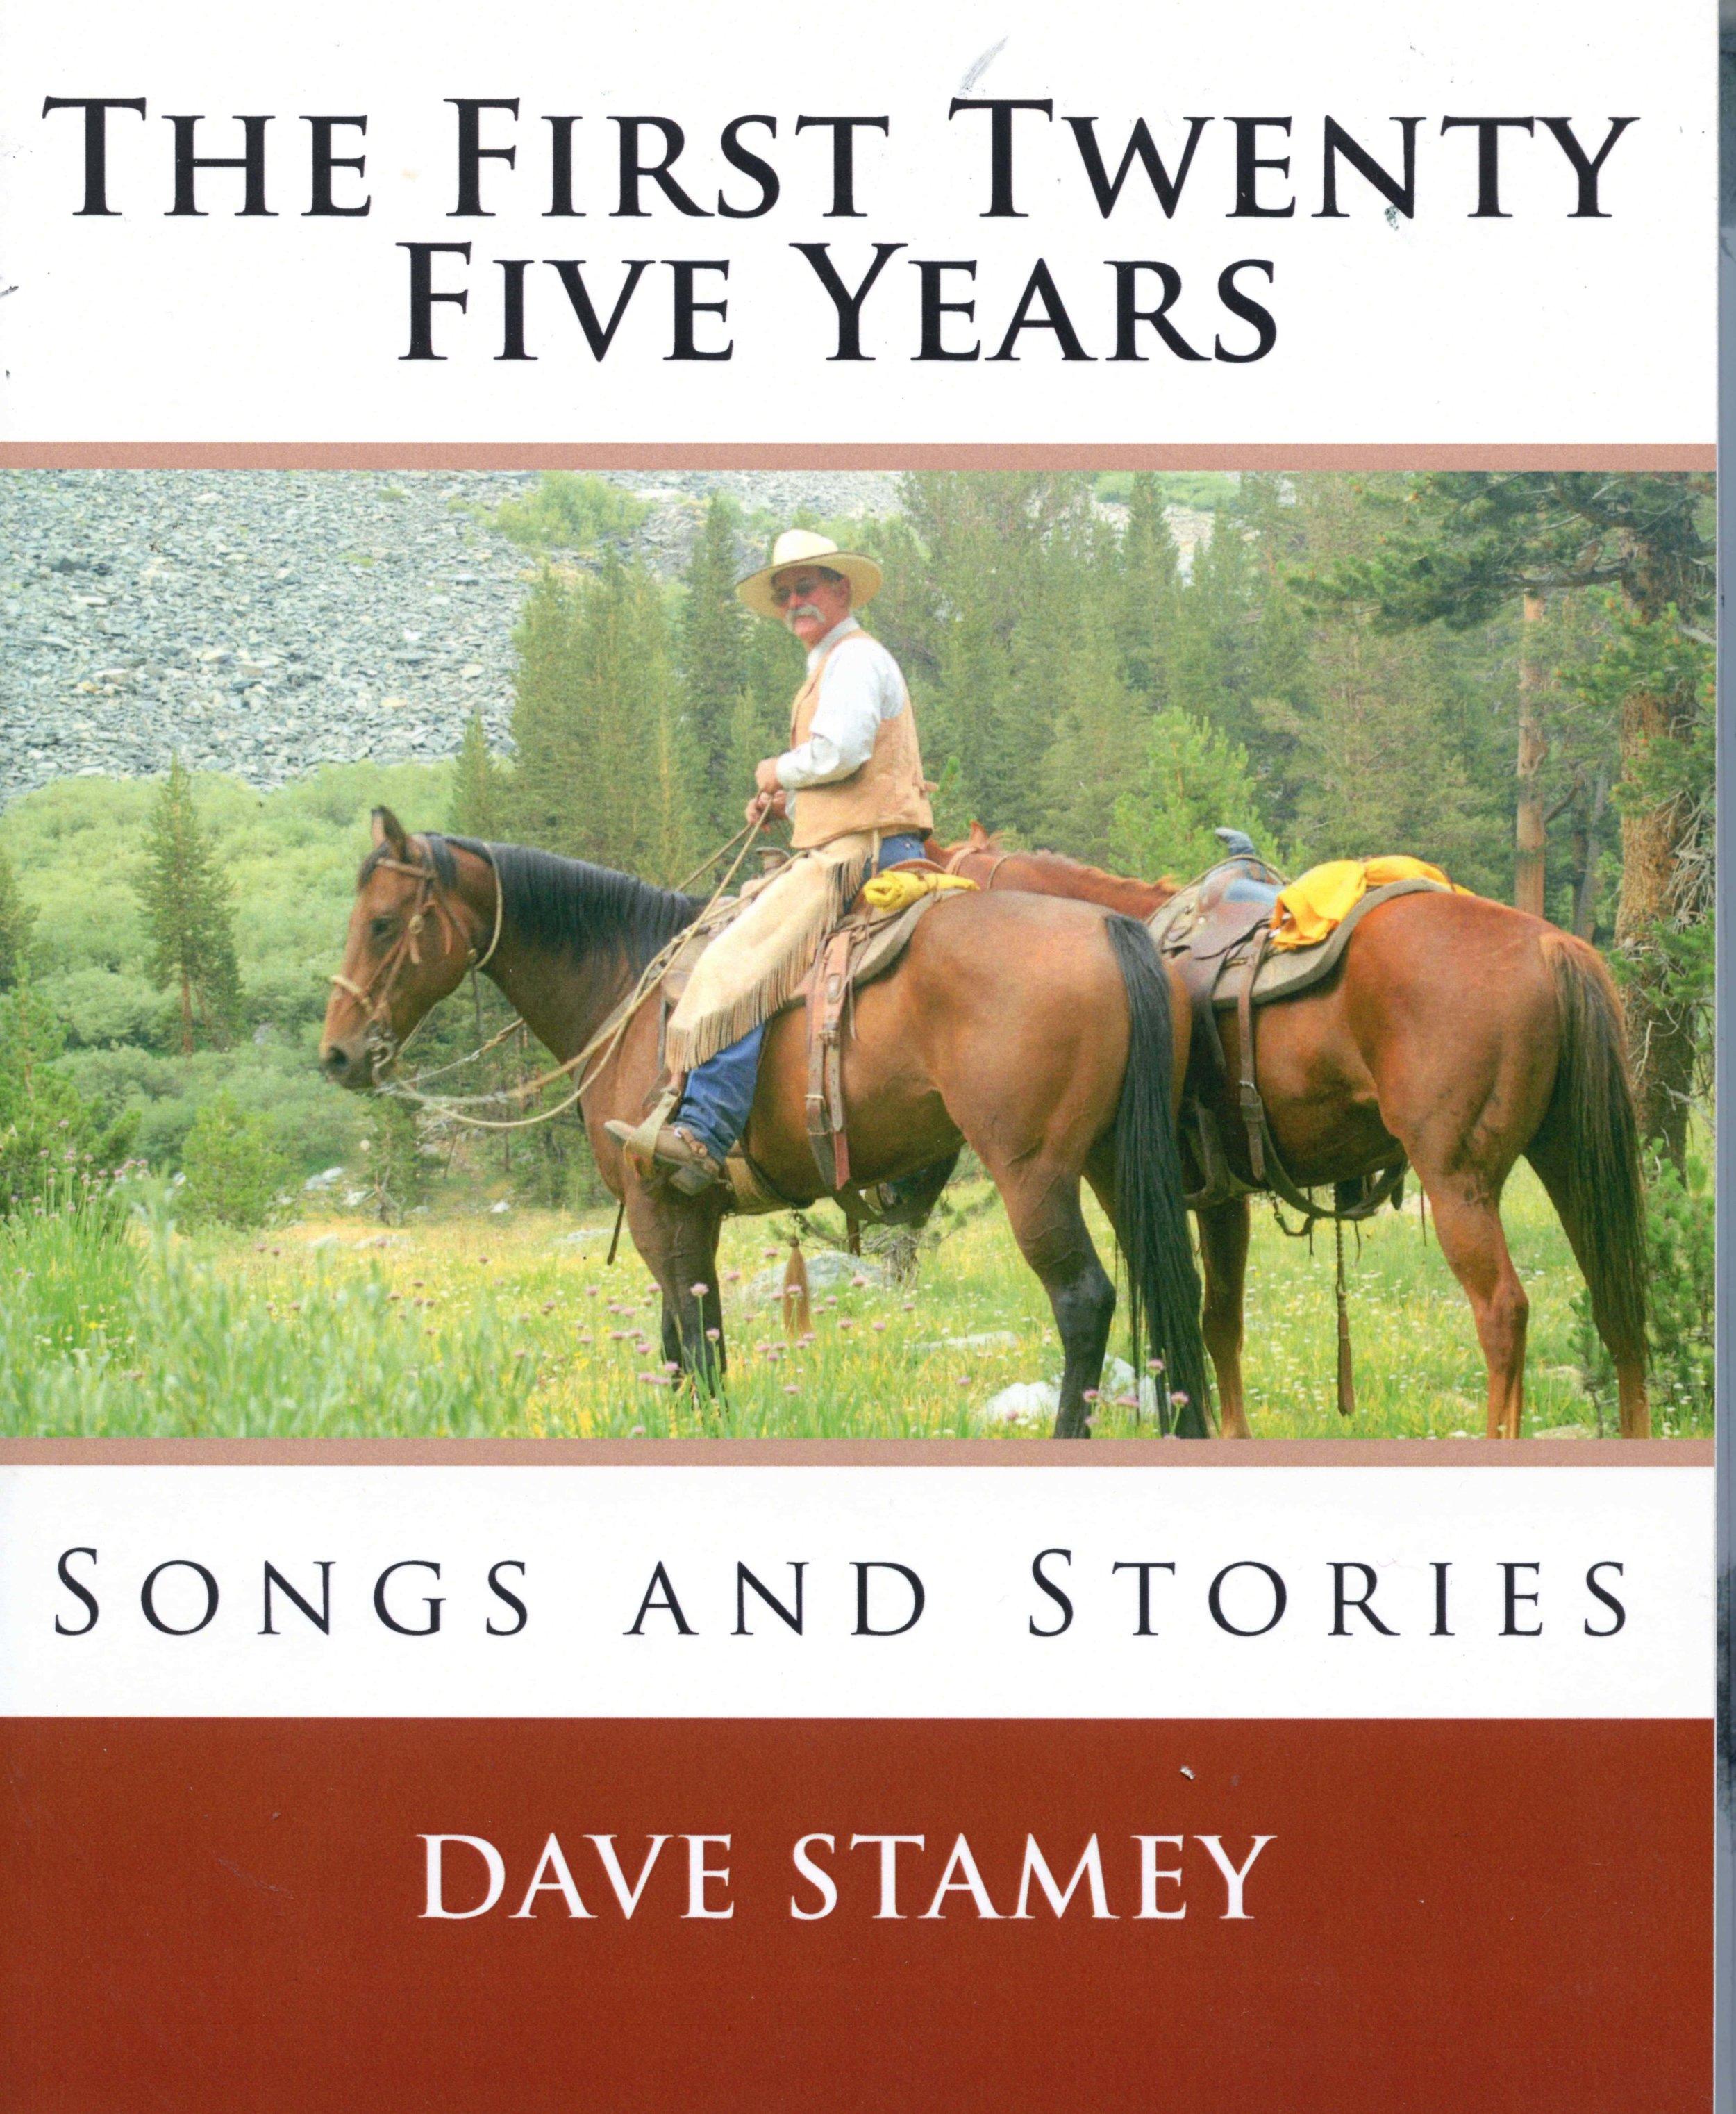 Dave book001 cropped.jpg